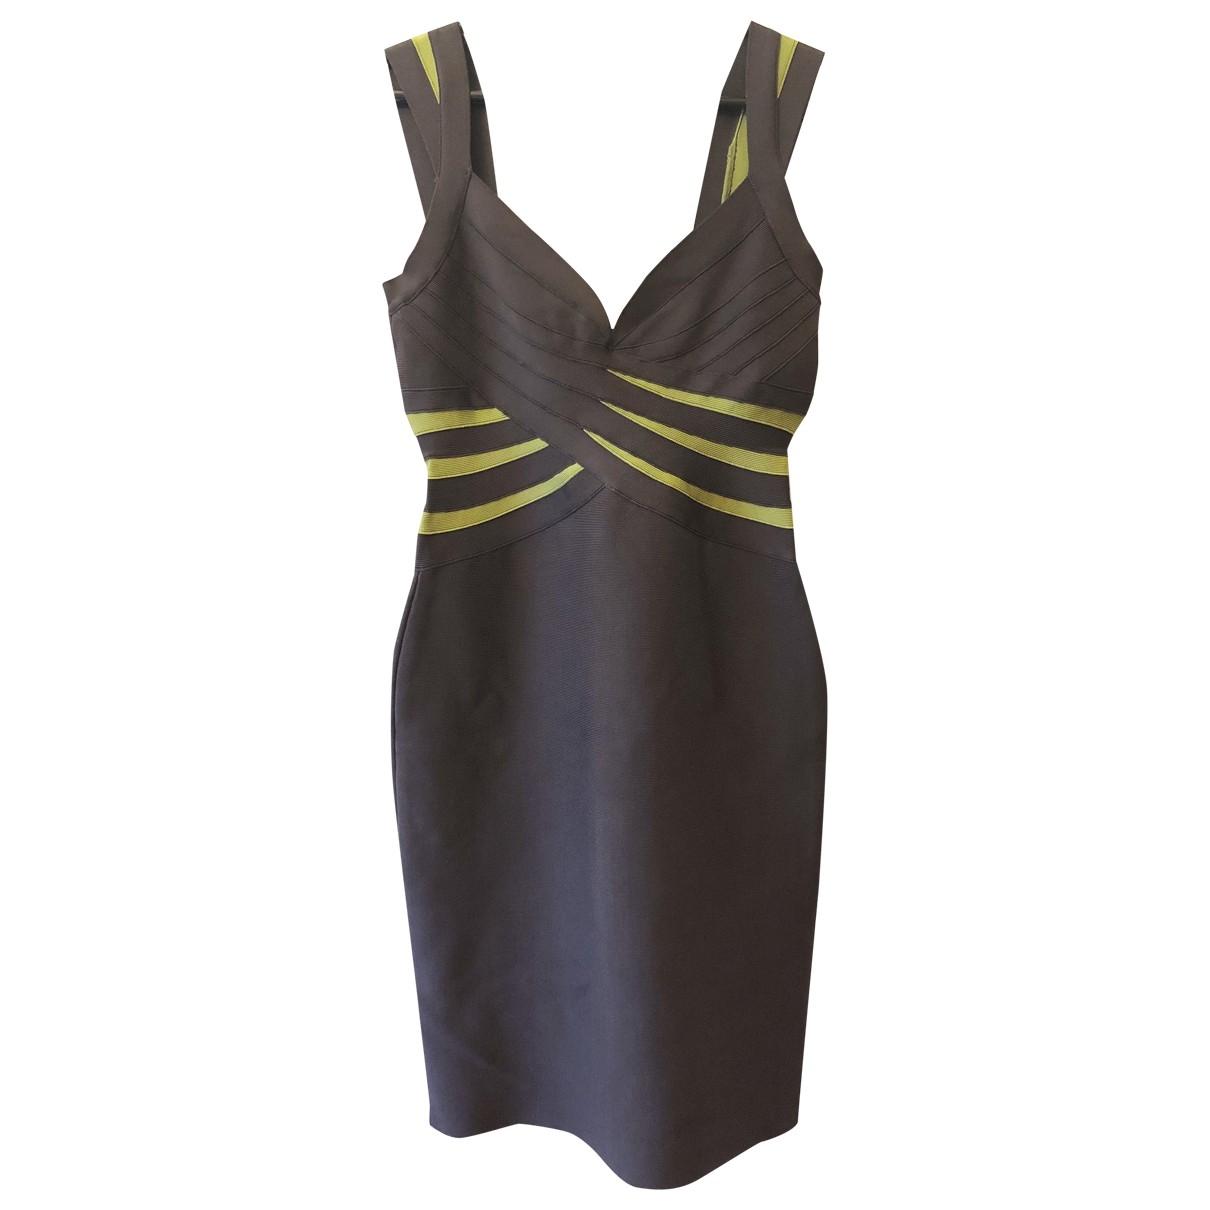 Herve Leger \N Grey dress for Women M International